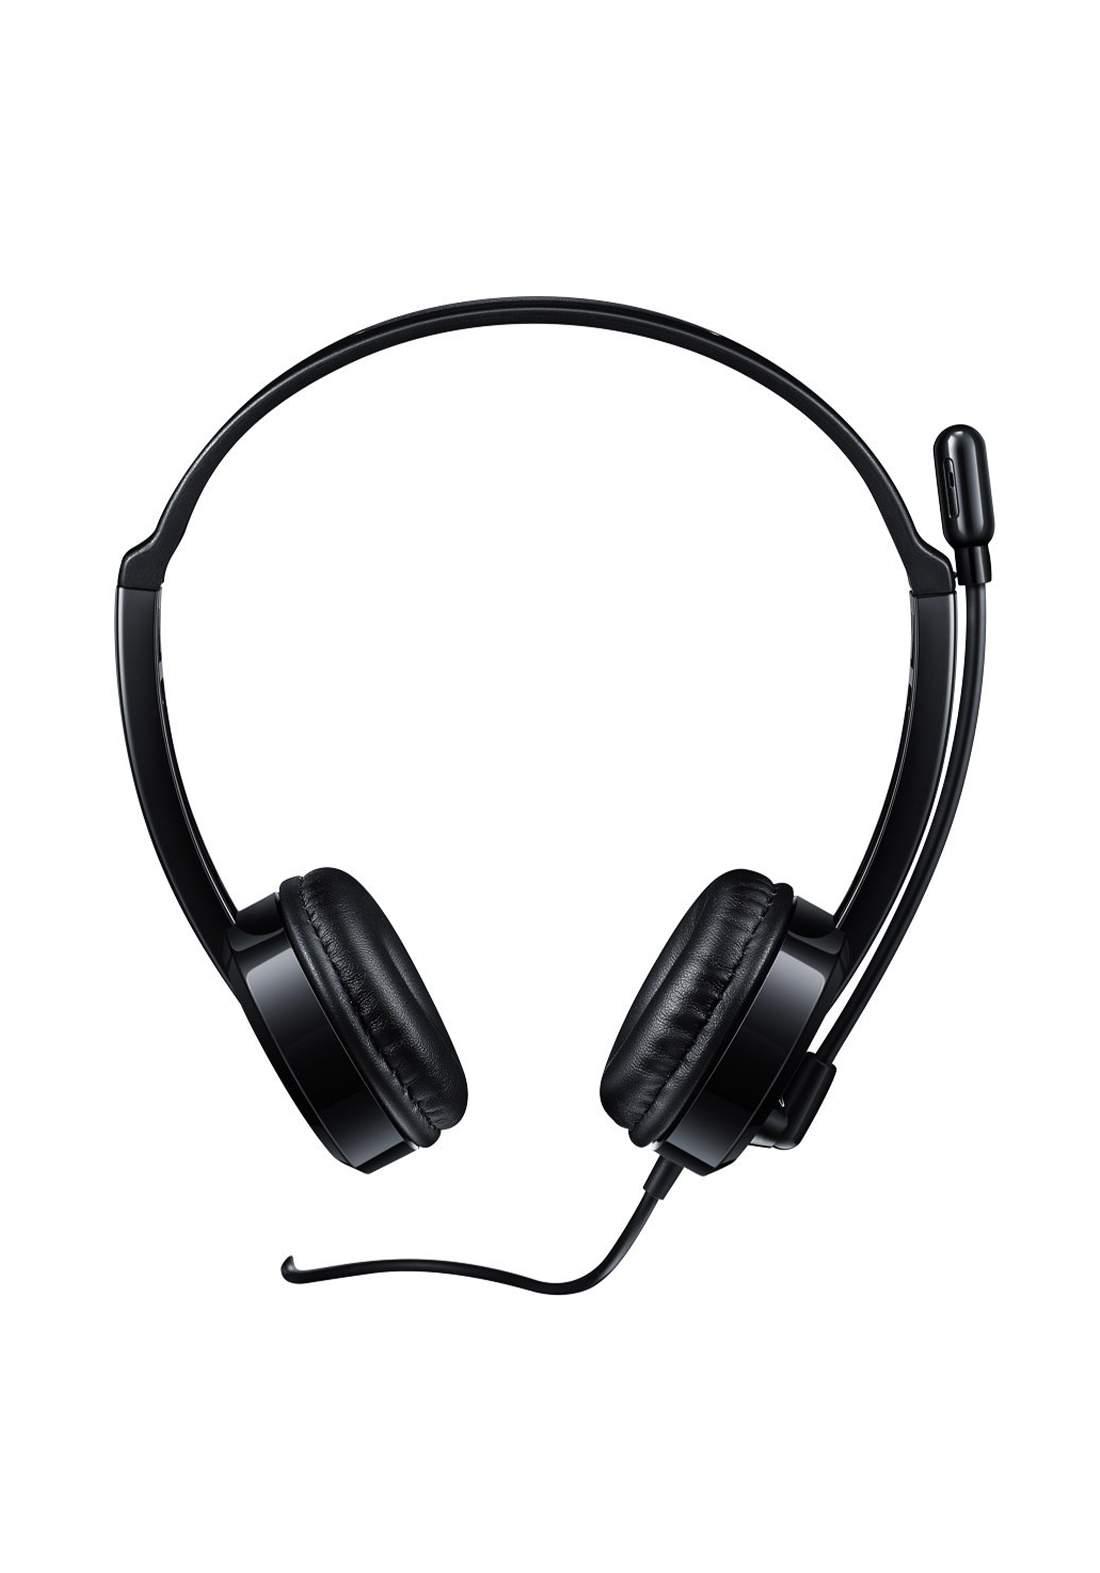 Rapoo H100 Wired Stereo Headset - Black سماعة سلكية